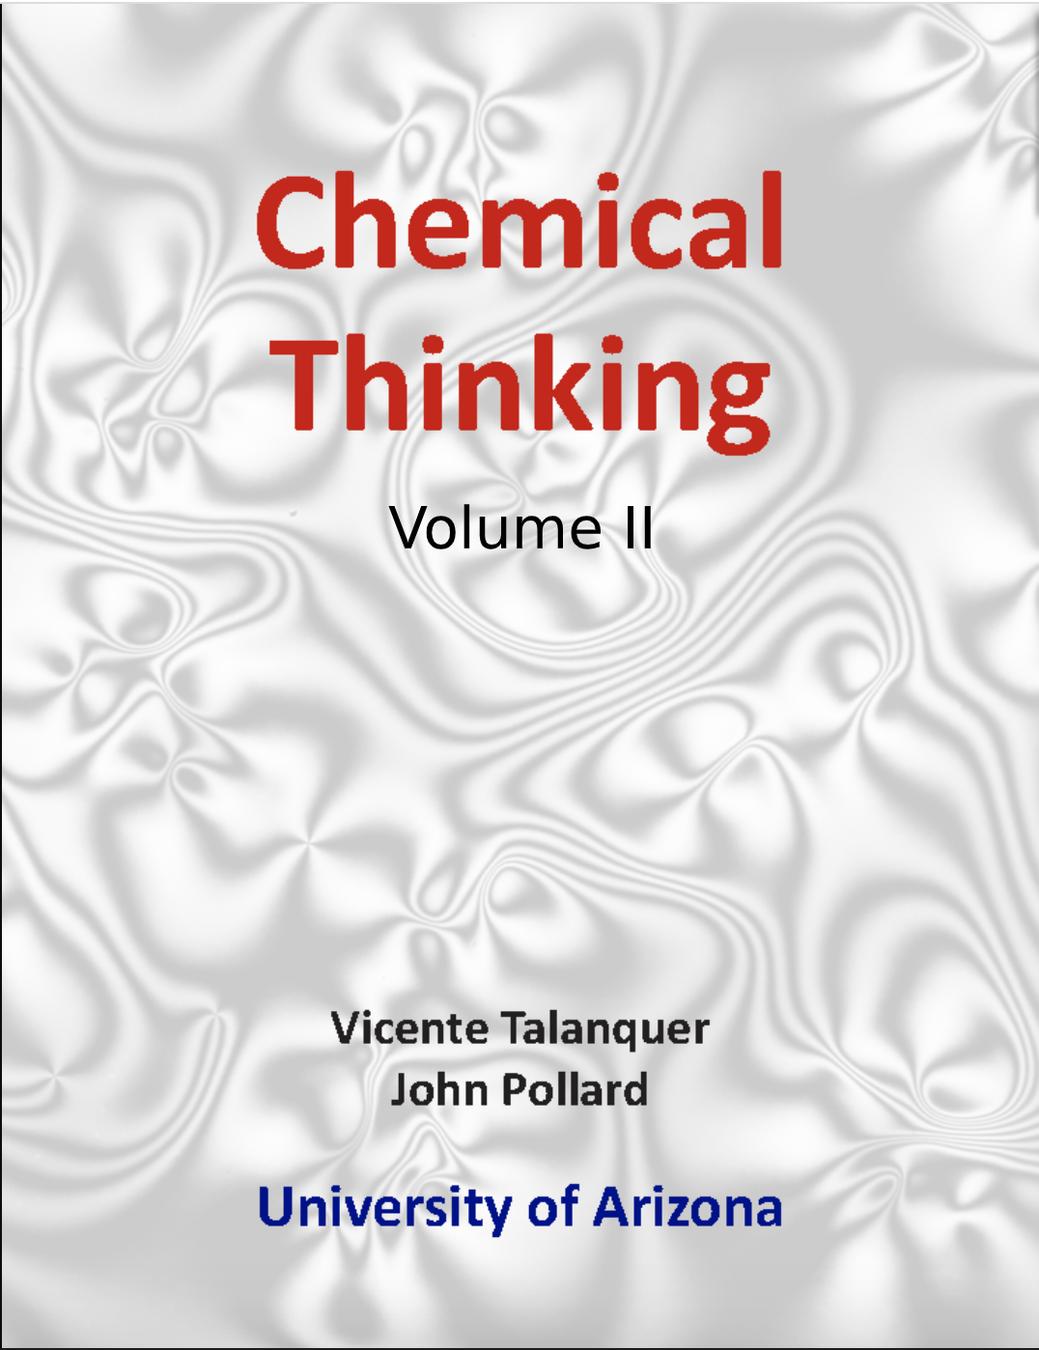 Chemical Thinking II